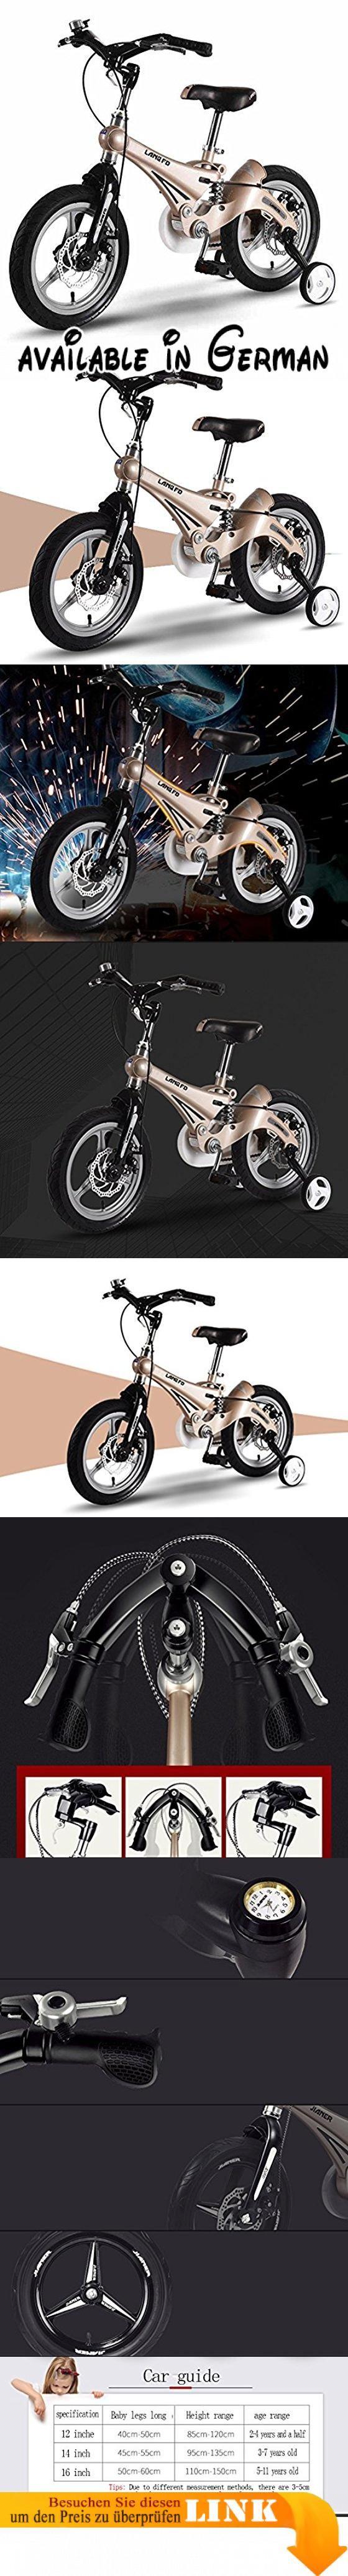 Kinderrad 12 14 16 Zoll Baby Stroller 3 6 Jahre alt Mountainbike Fahrrad